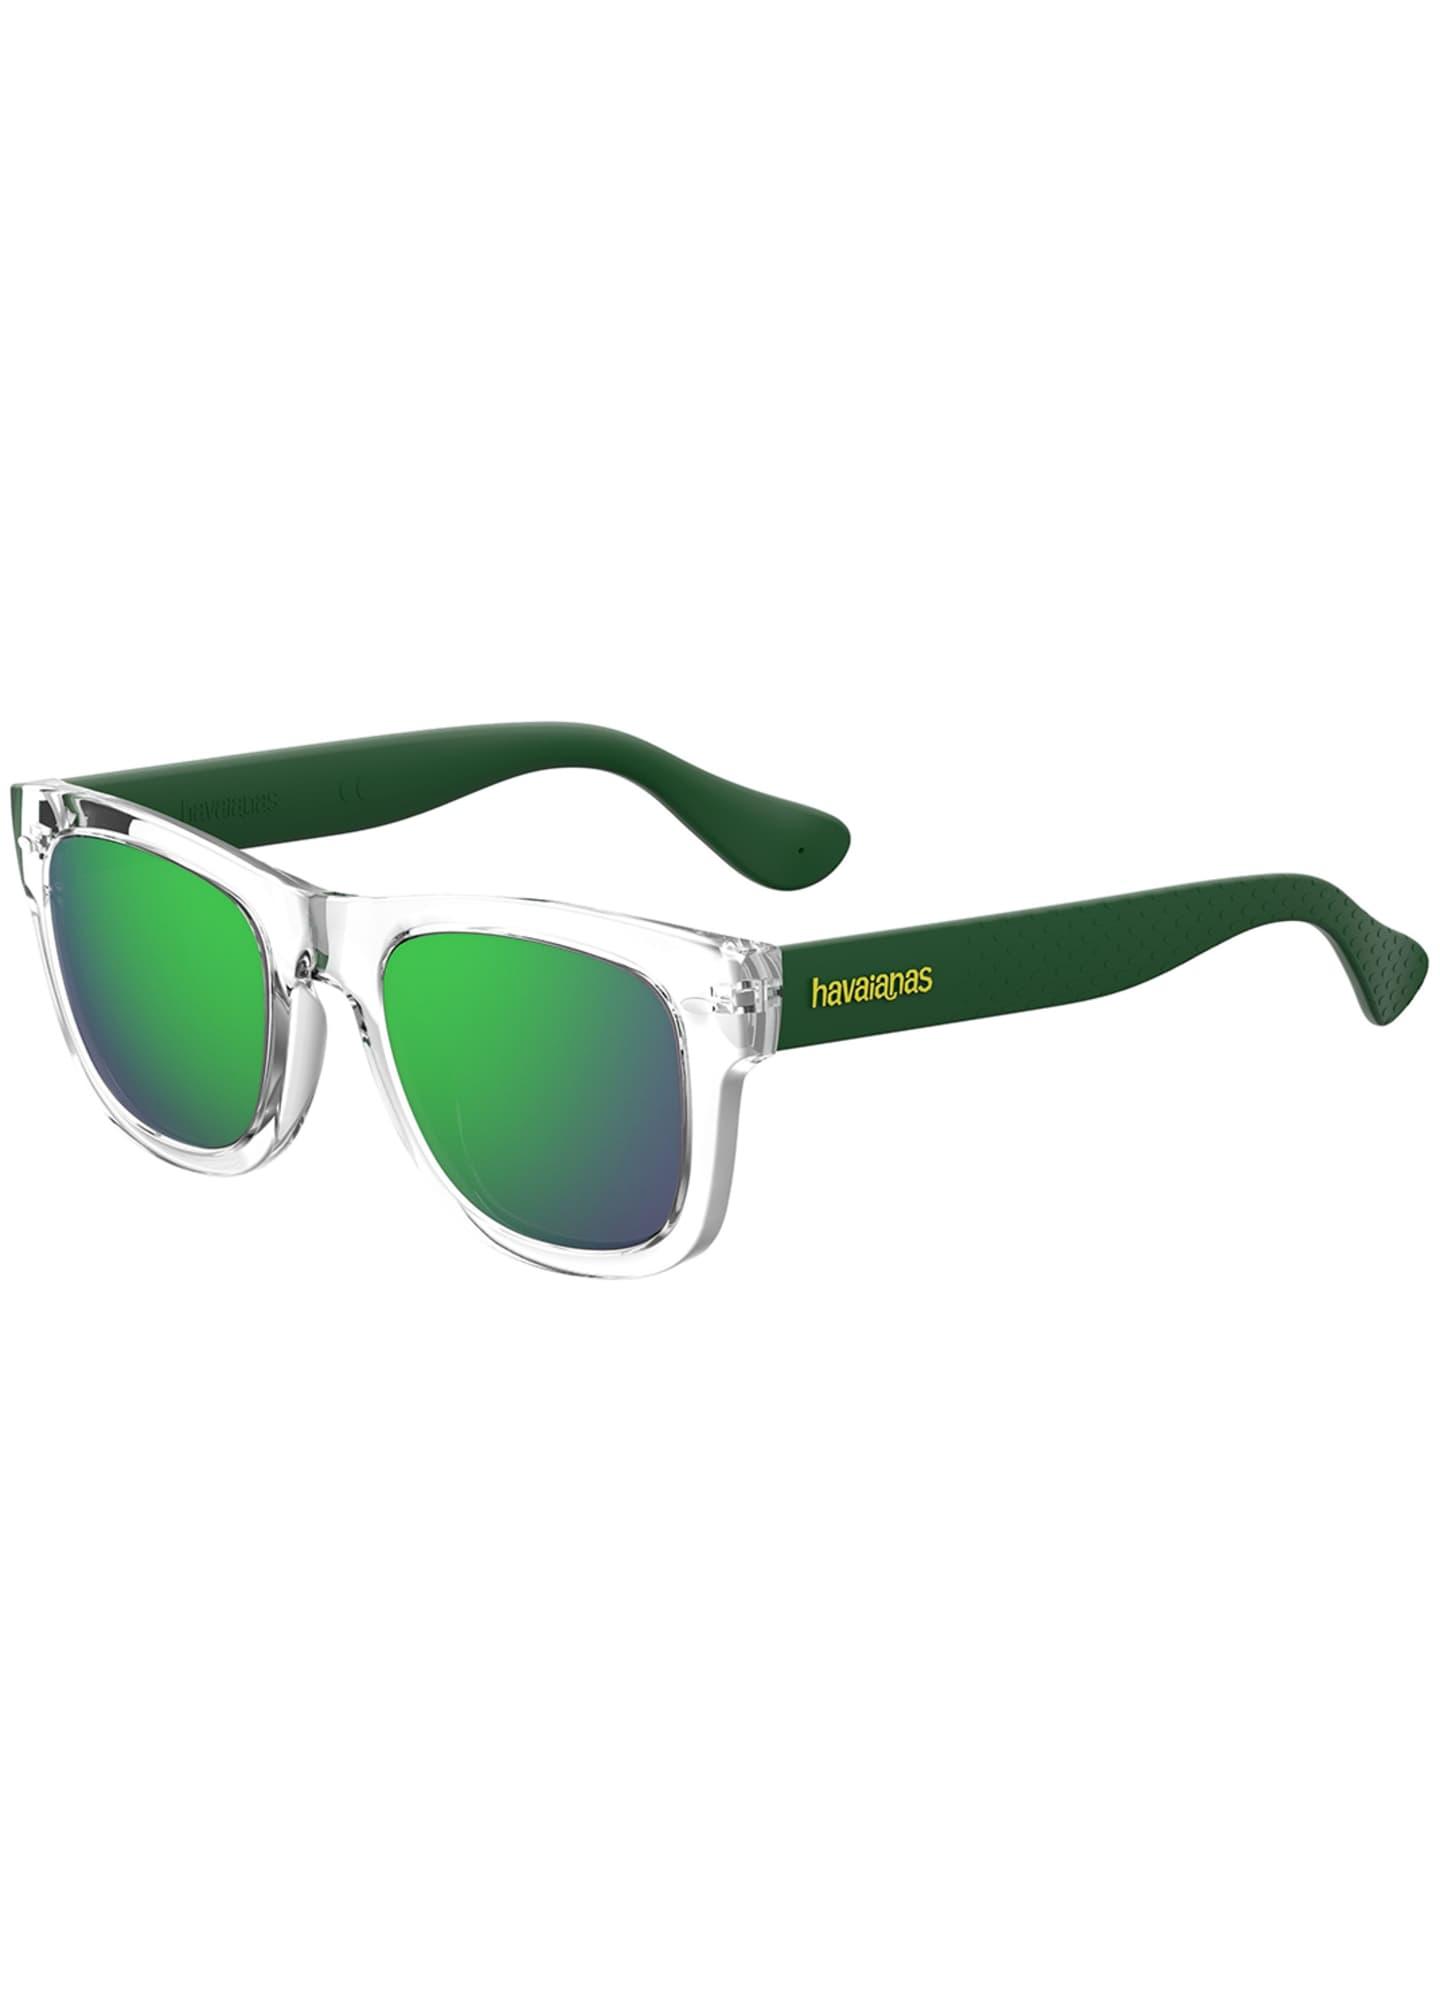 Havaianas Paratym Two-Tone Rubber Sunglasses